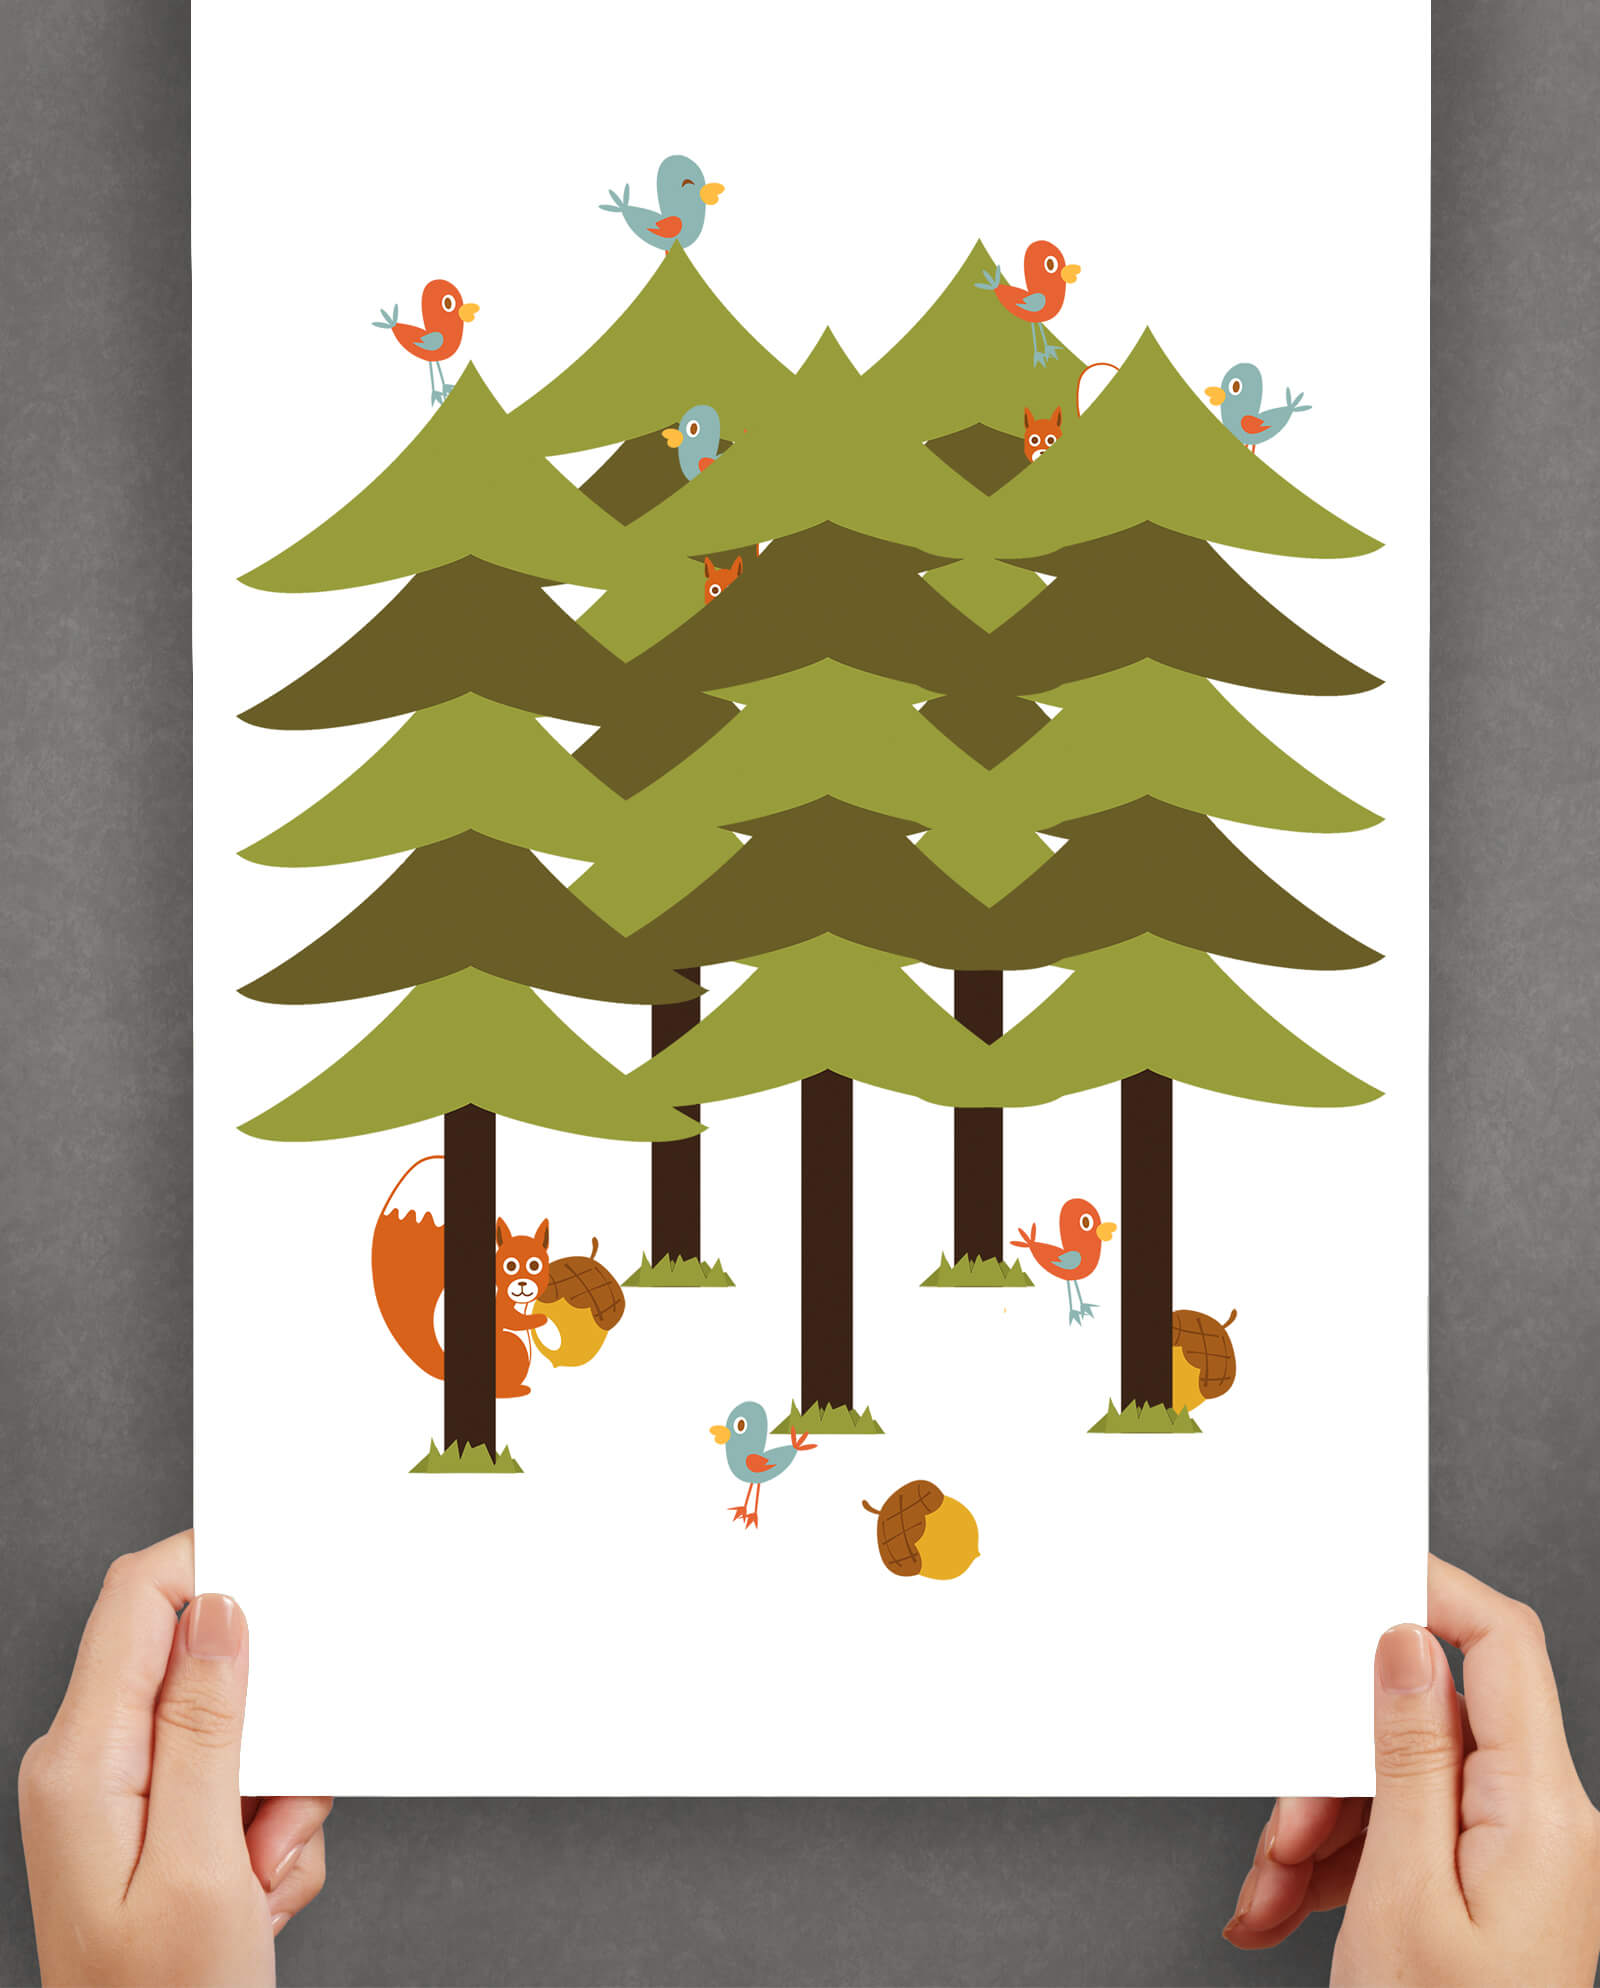 skov-farve-groen-2